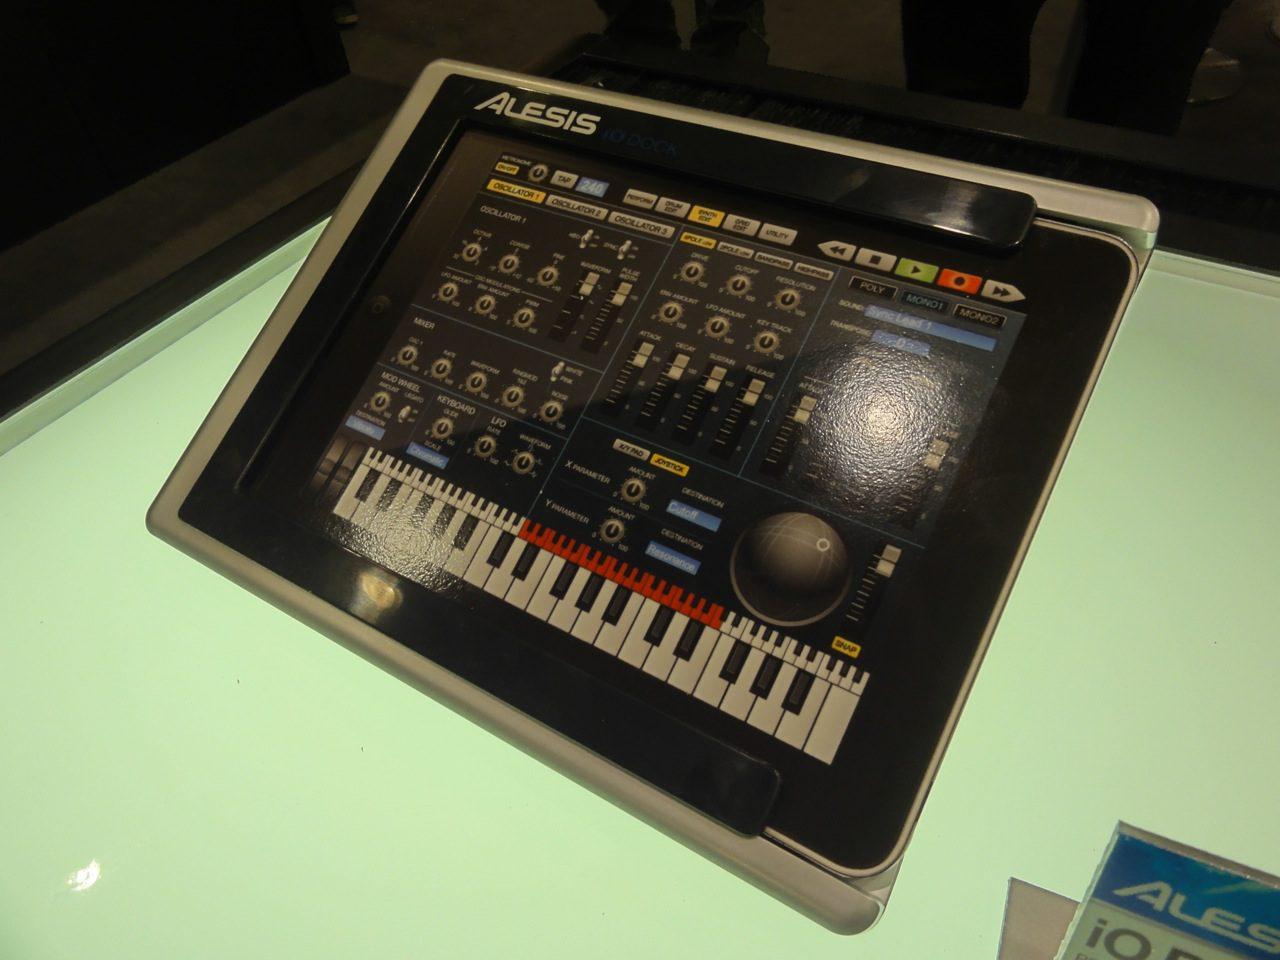 Alesis IO-Dock: iPad Docking Station